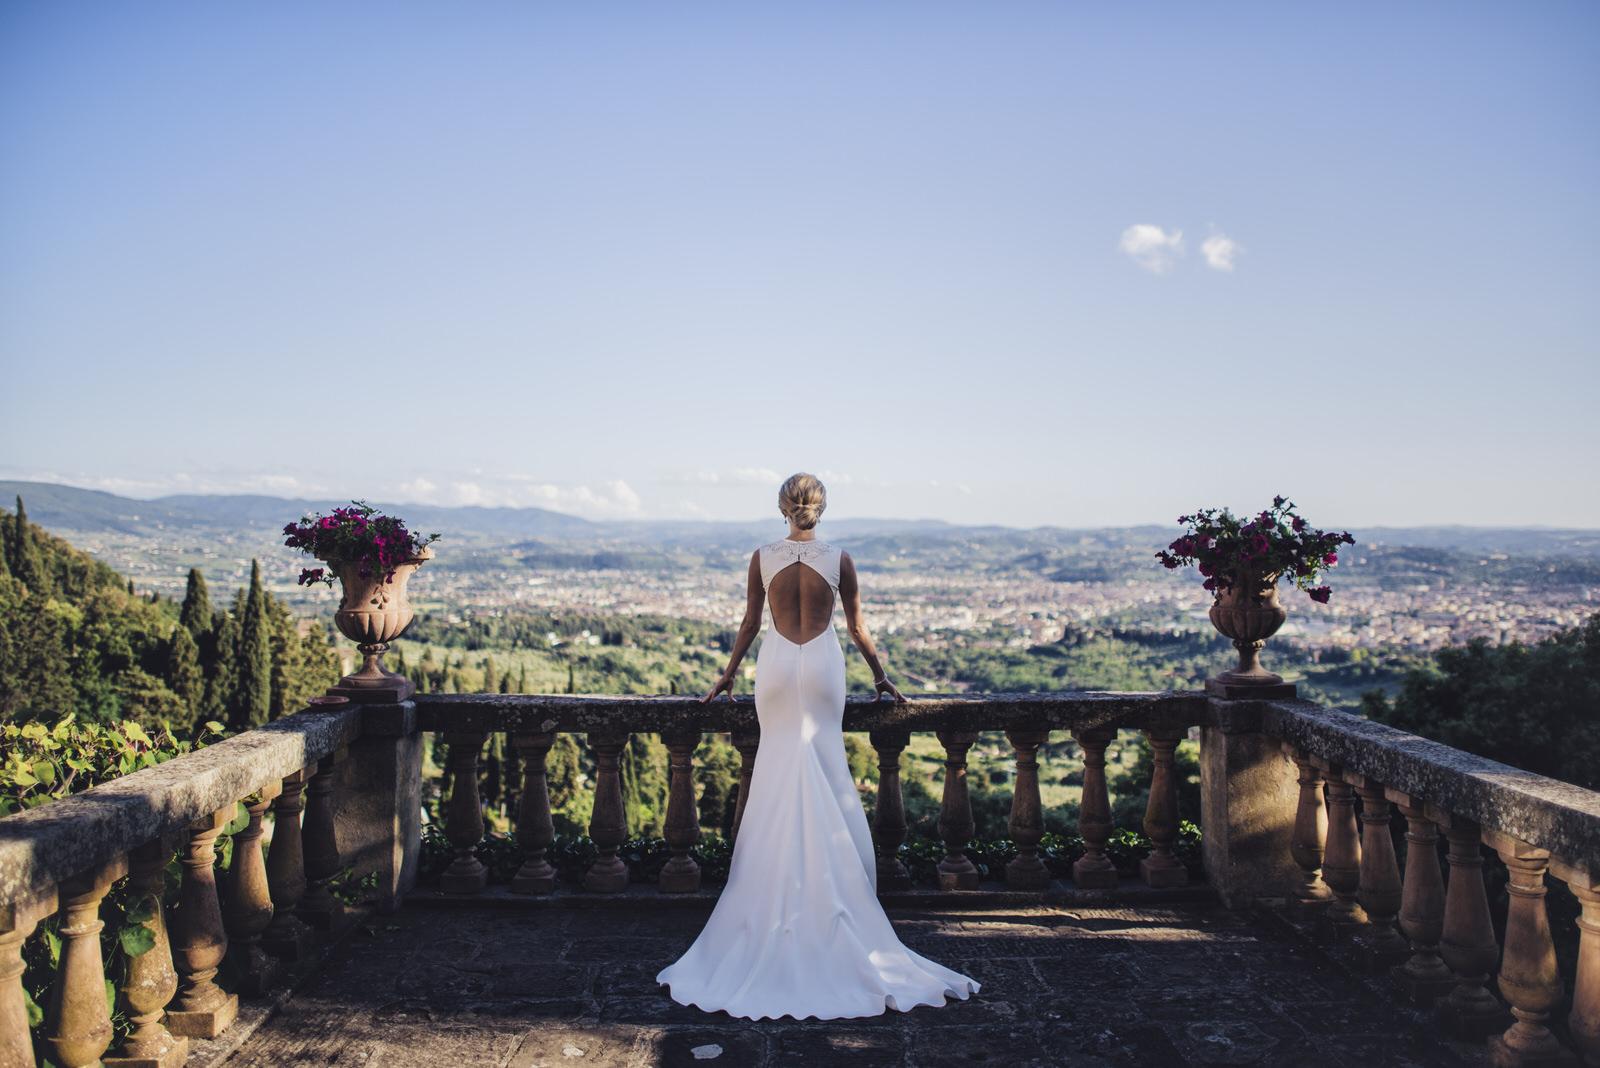 wedding photographer in italy-venice-tuscany-florence-amalfi coast-como lake-villa del balbianello-siena-amalfi-ravello-belmond-villa cimbrone12